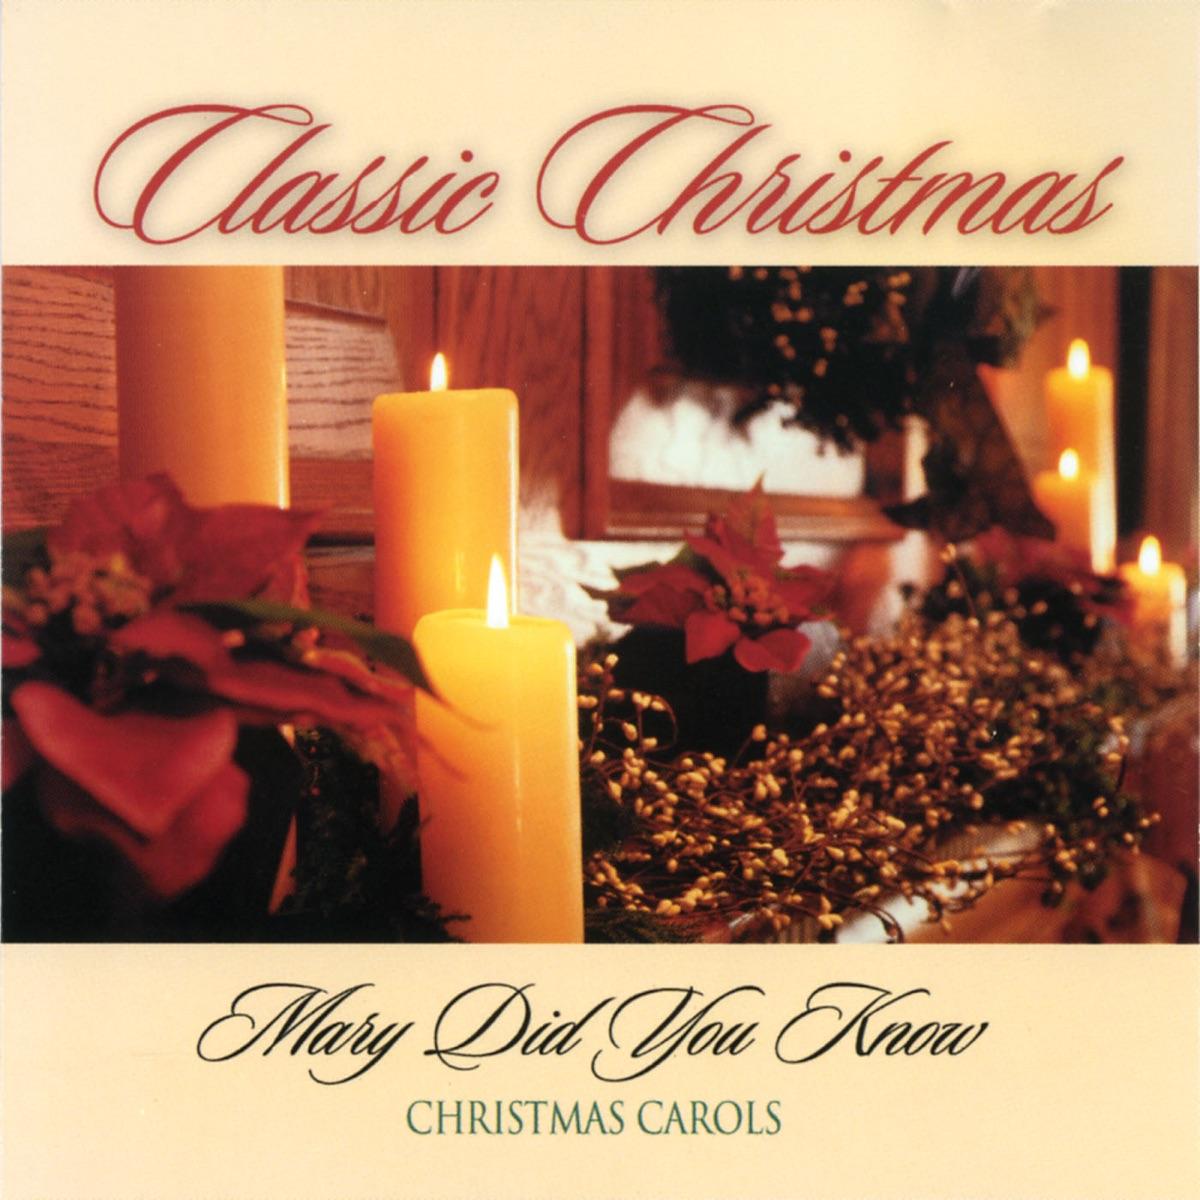 21 classic christmas favorites classic christmas classic christmas classic christmas the classic christmas album